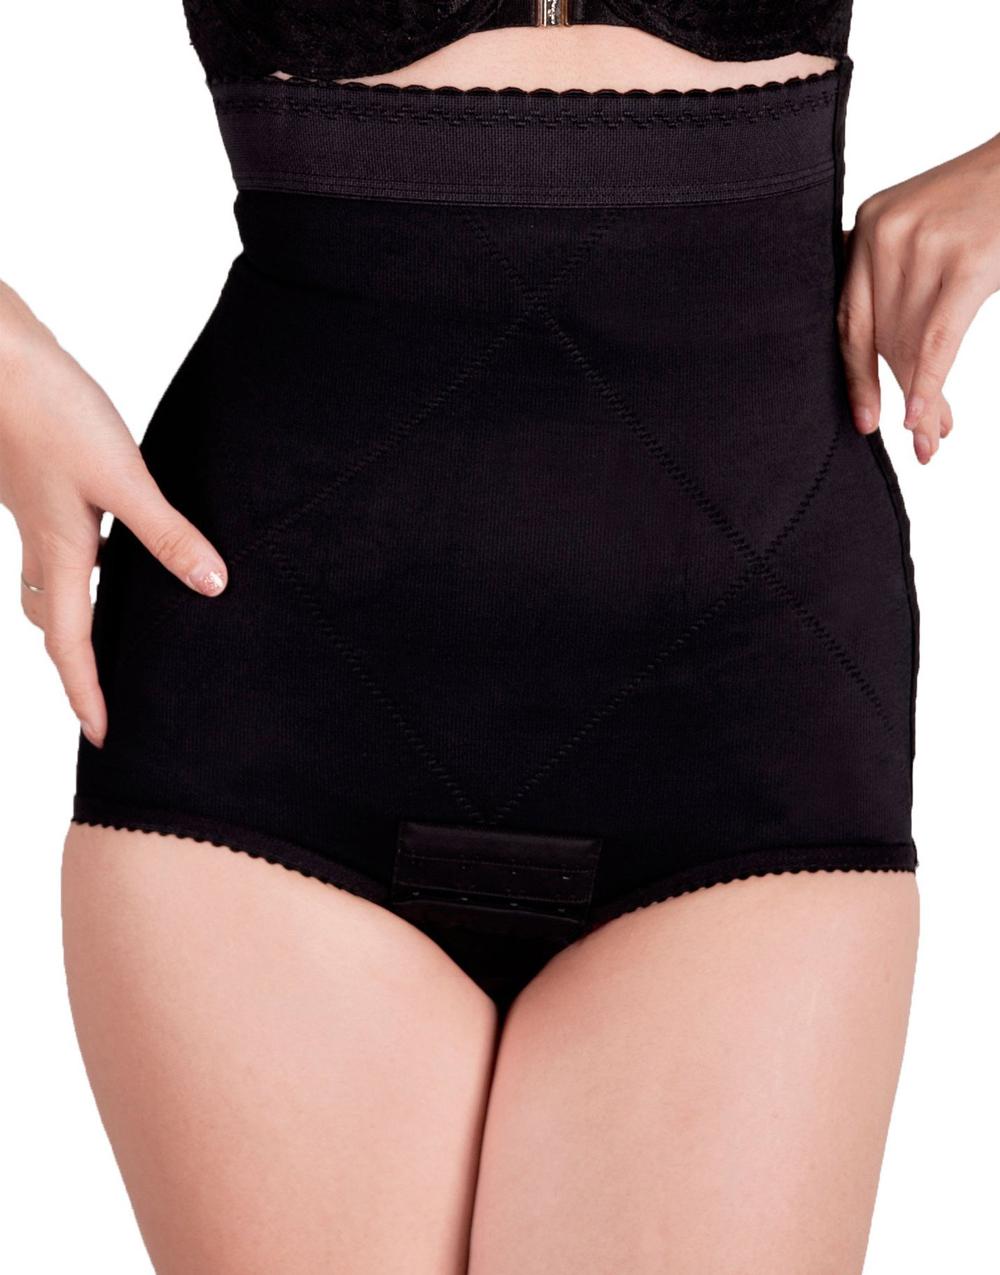 Postpartum Ultra Bikini in Black by Wink Shapewear | MEDIUM